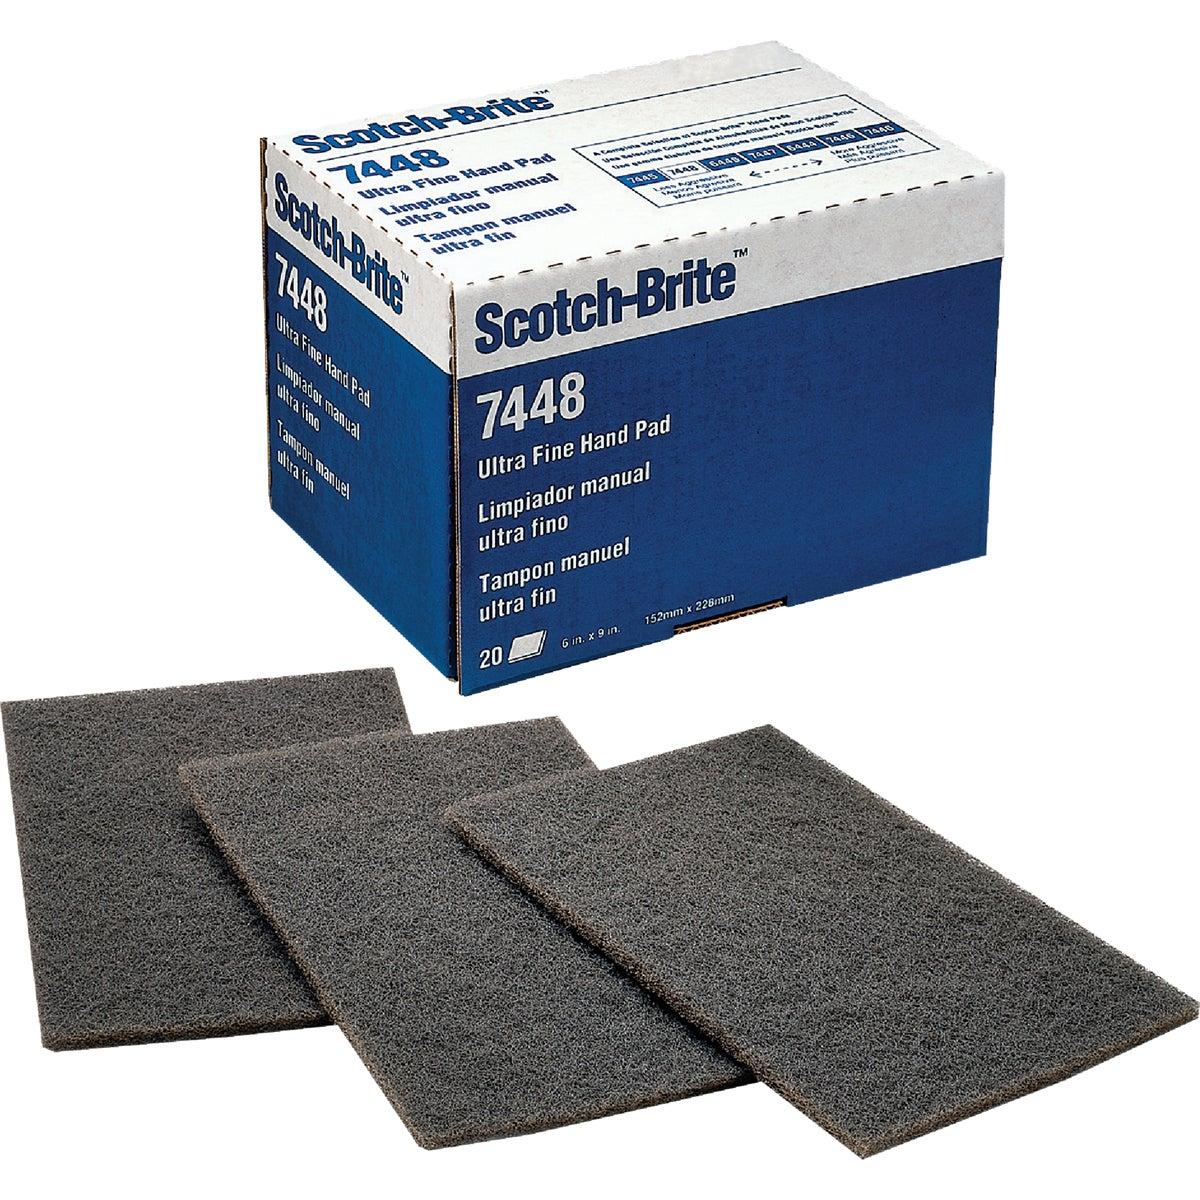 3M SCOTCHBRITE GRY HAND PAD 7448